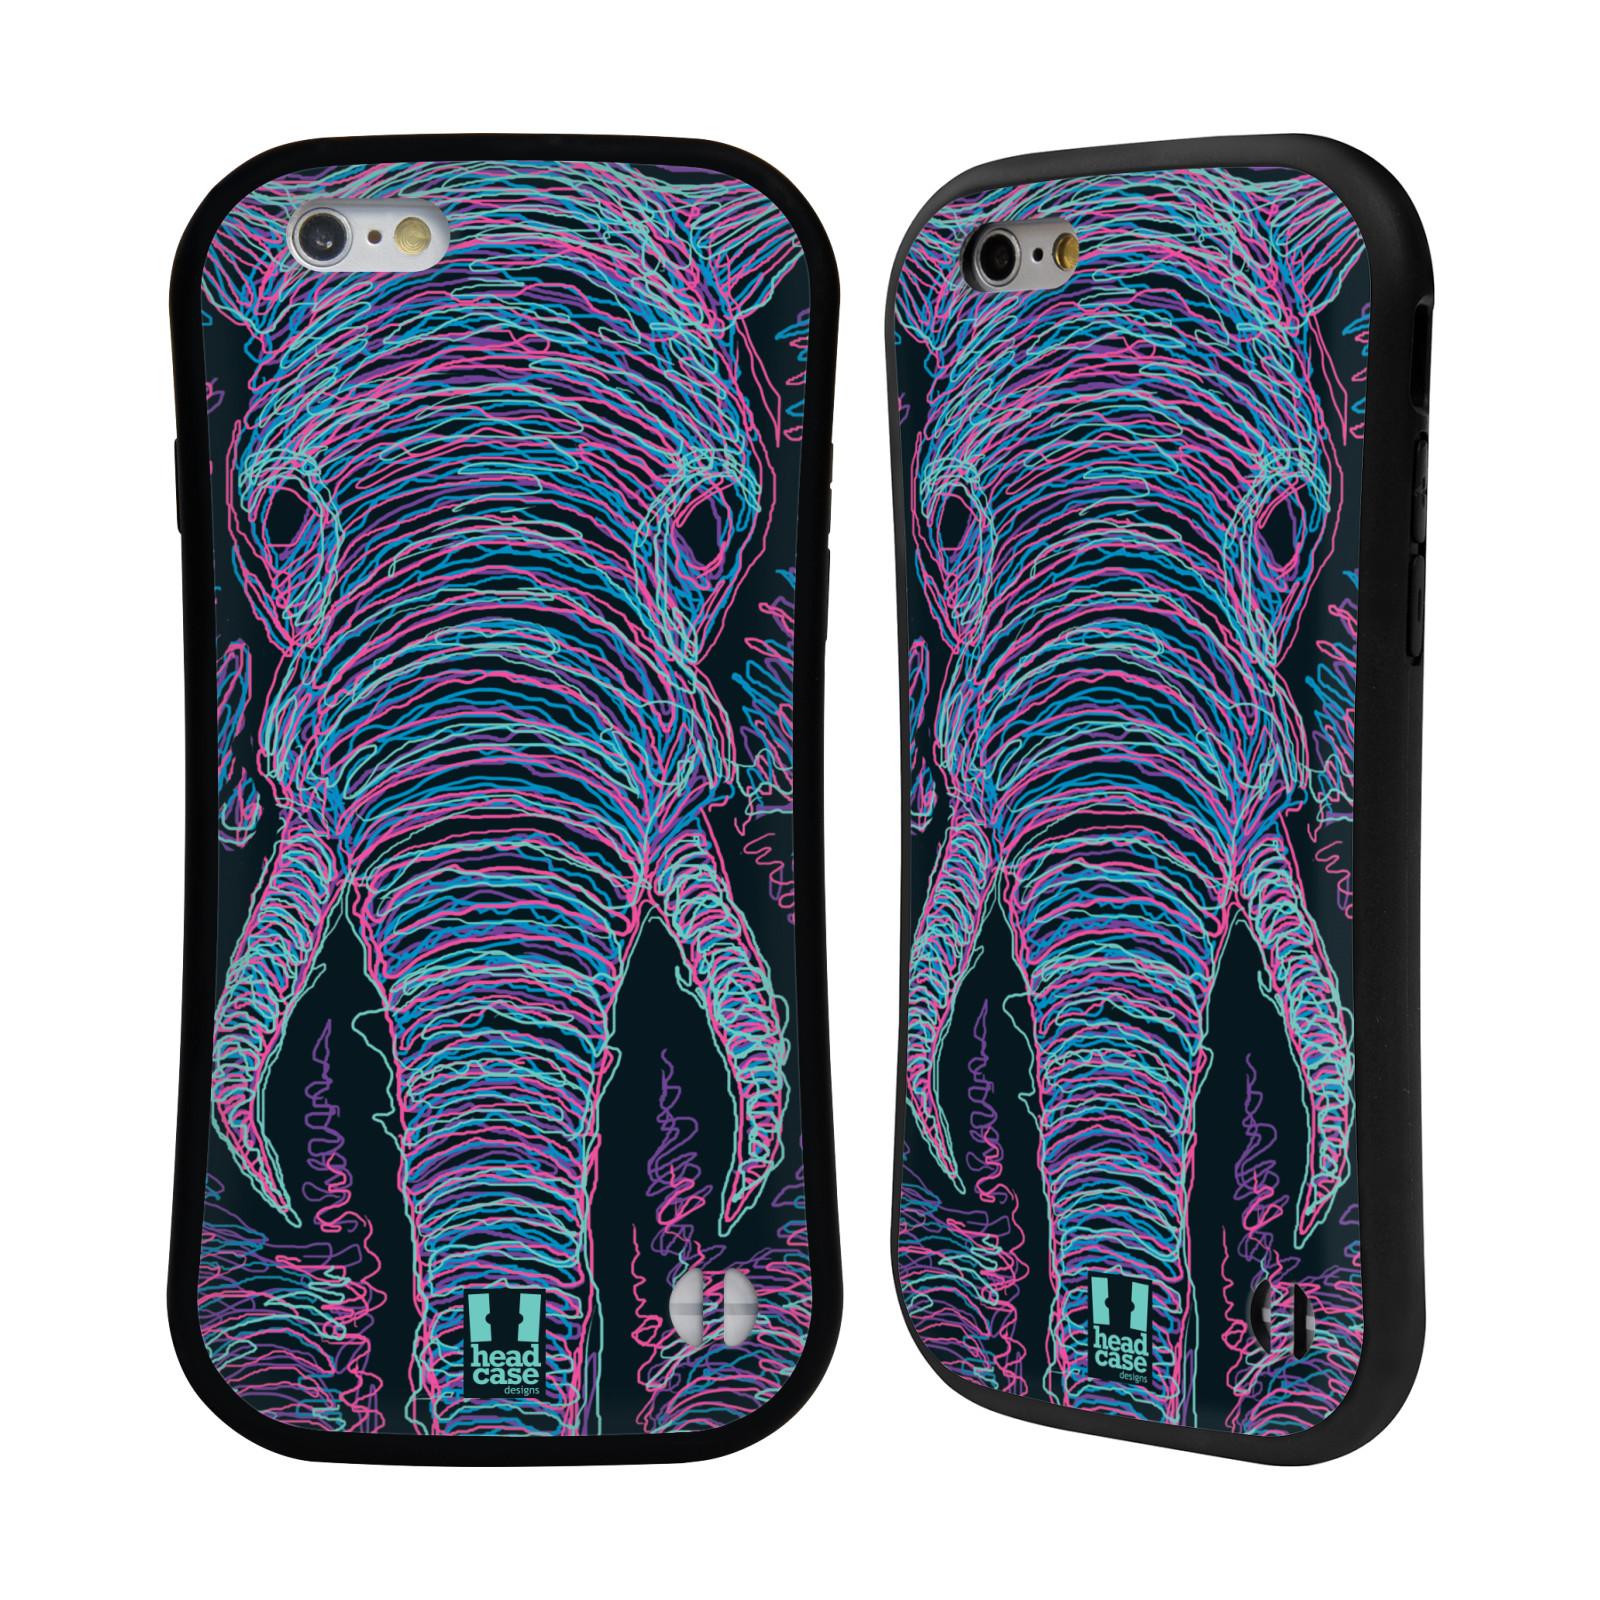 HEAD CASE silikon/plast odolný obal na mobil Apple Iphone 6/6S vzor zvíře čmáranice slon